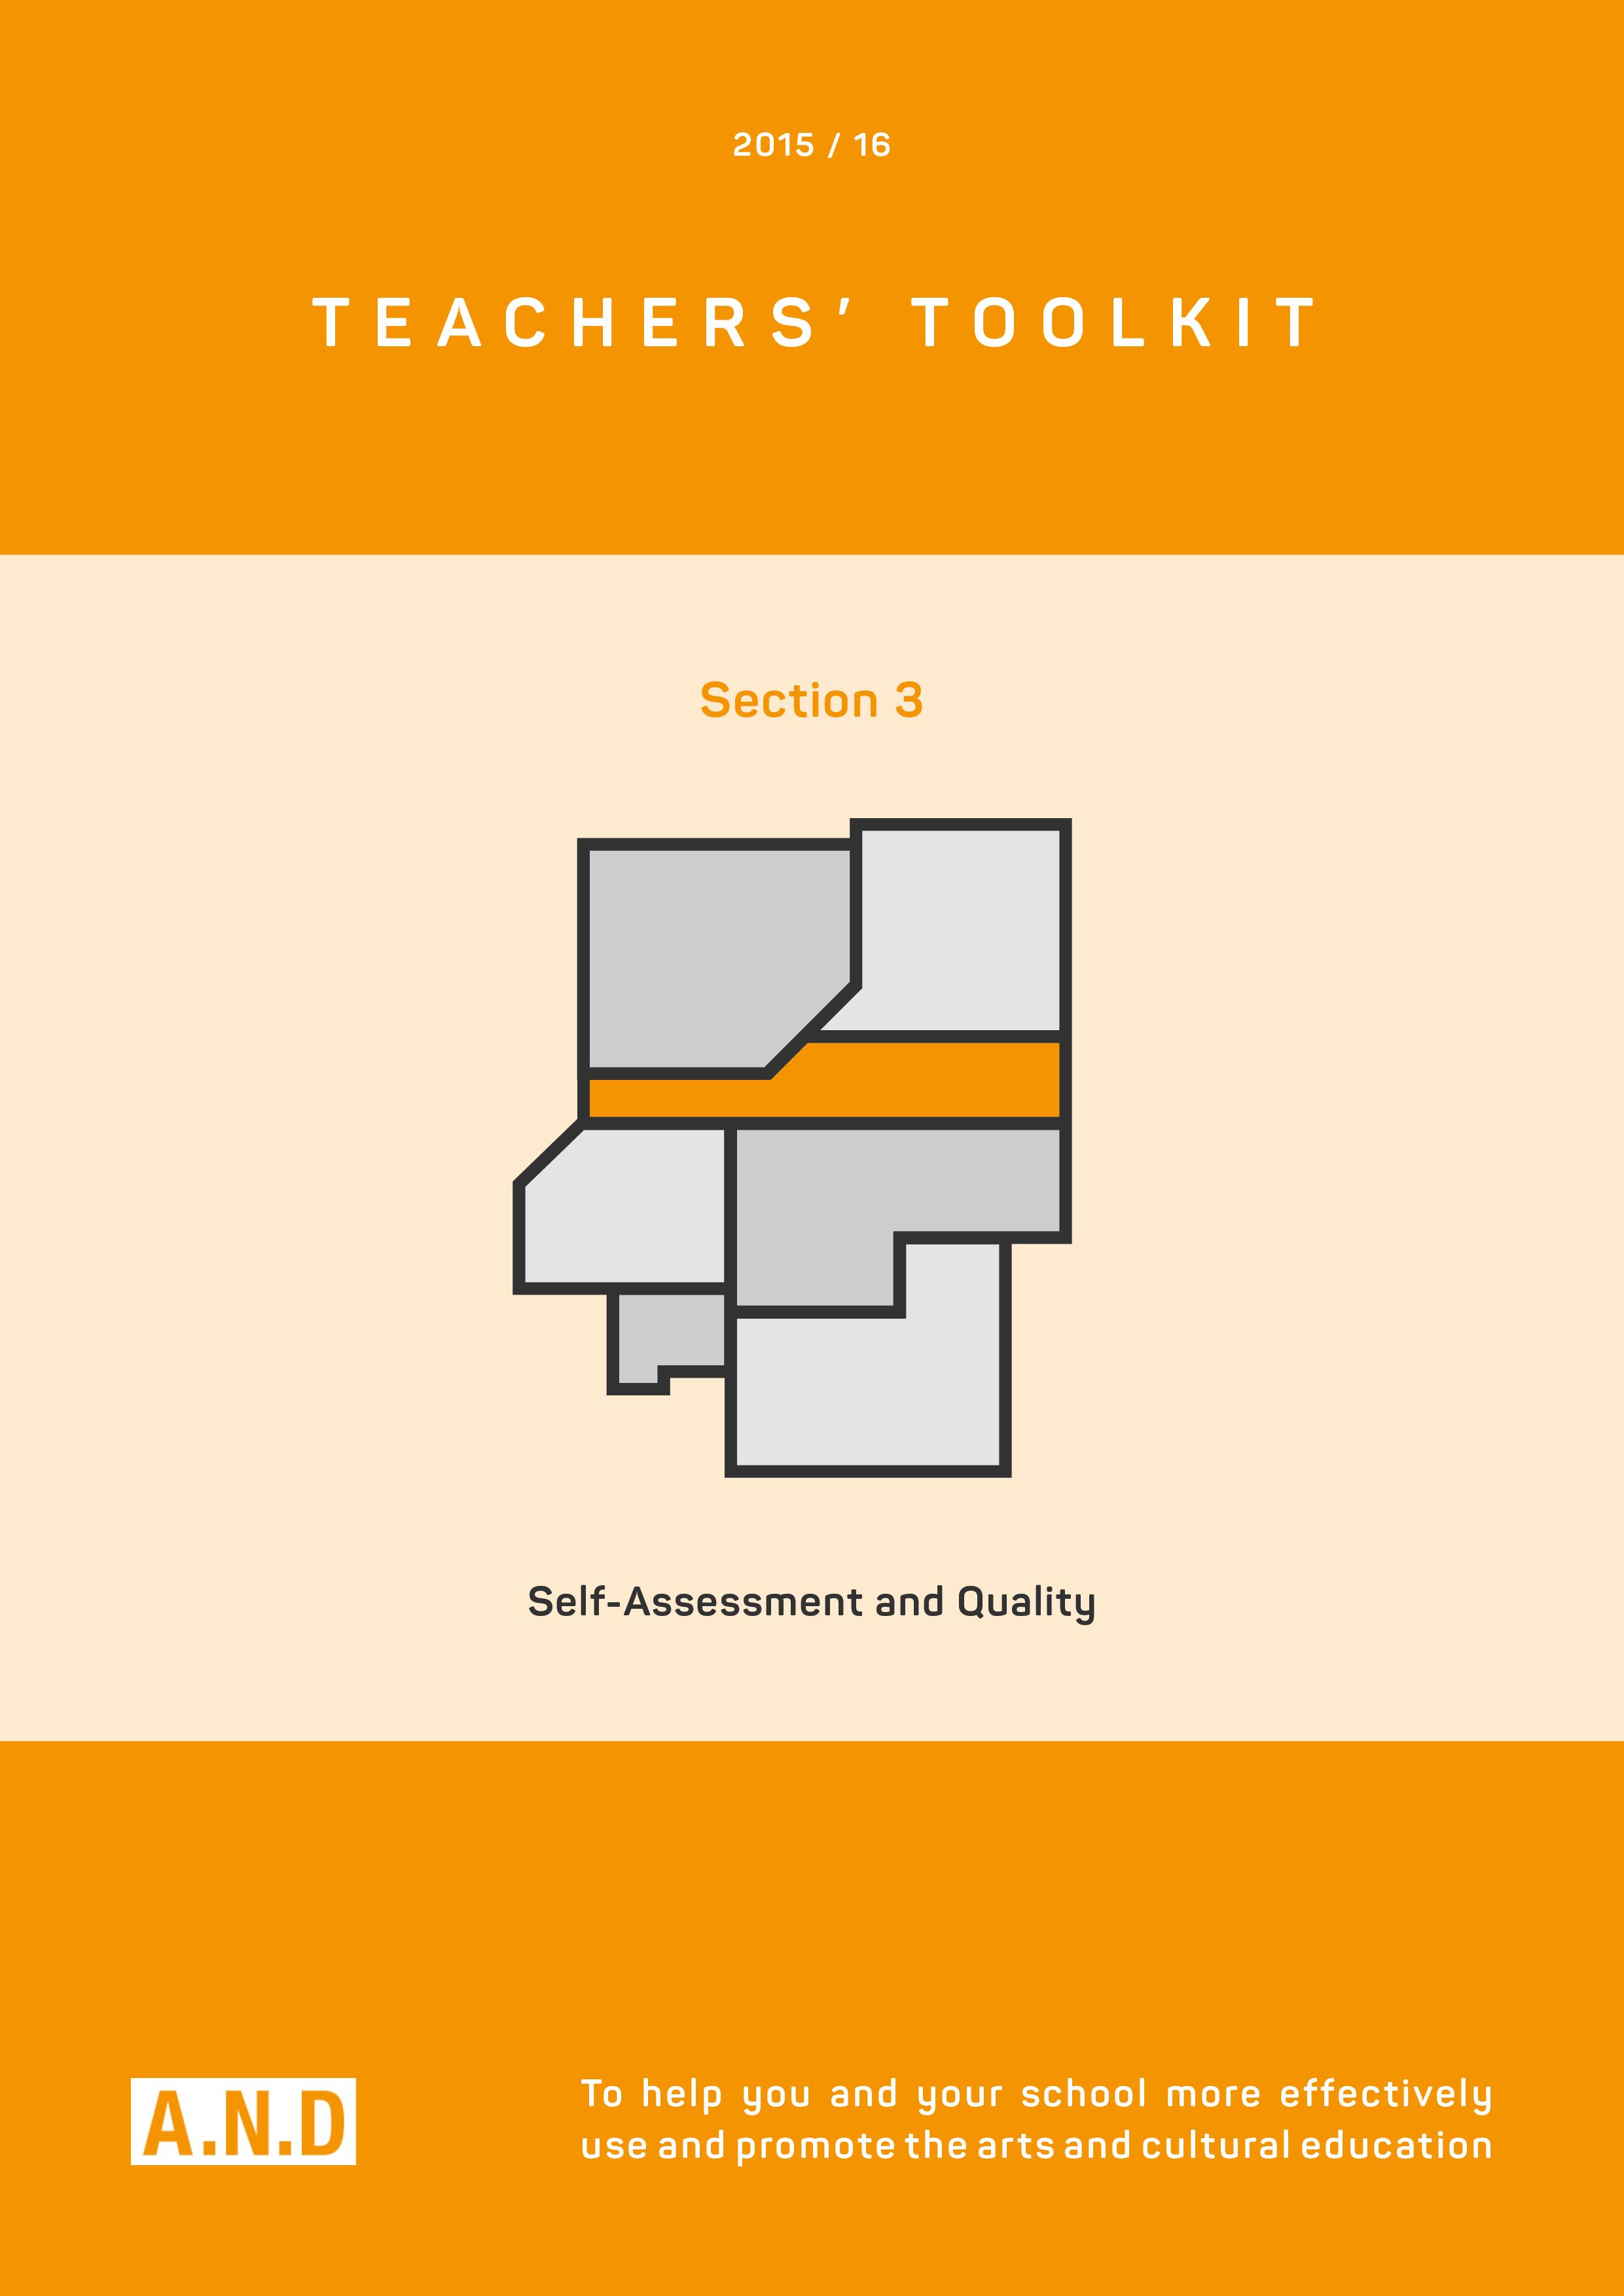 Teachers toolkit(121015)_78.png